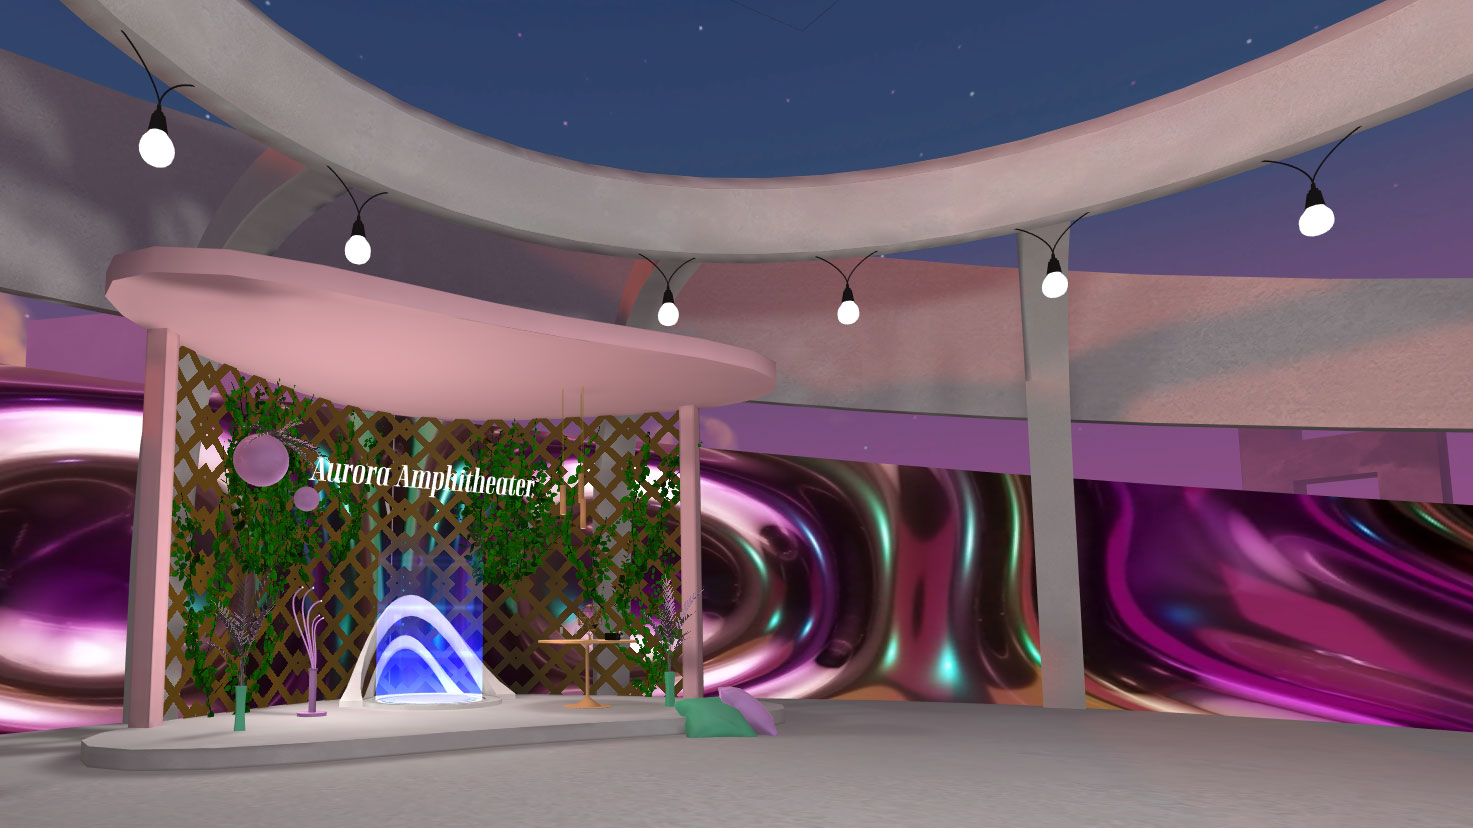 AltspaceVR screenshot: a teleport entrance to Aurora Amphitheater.